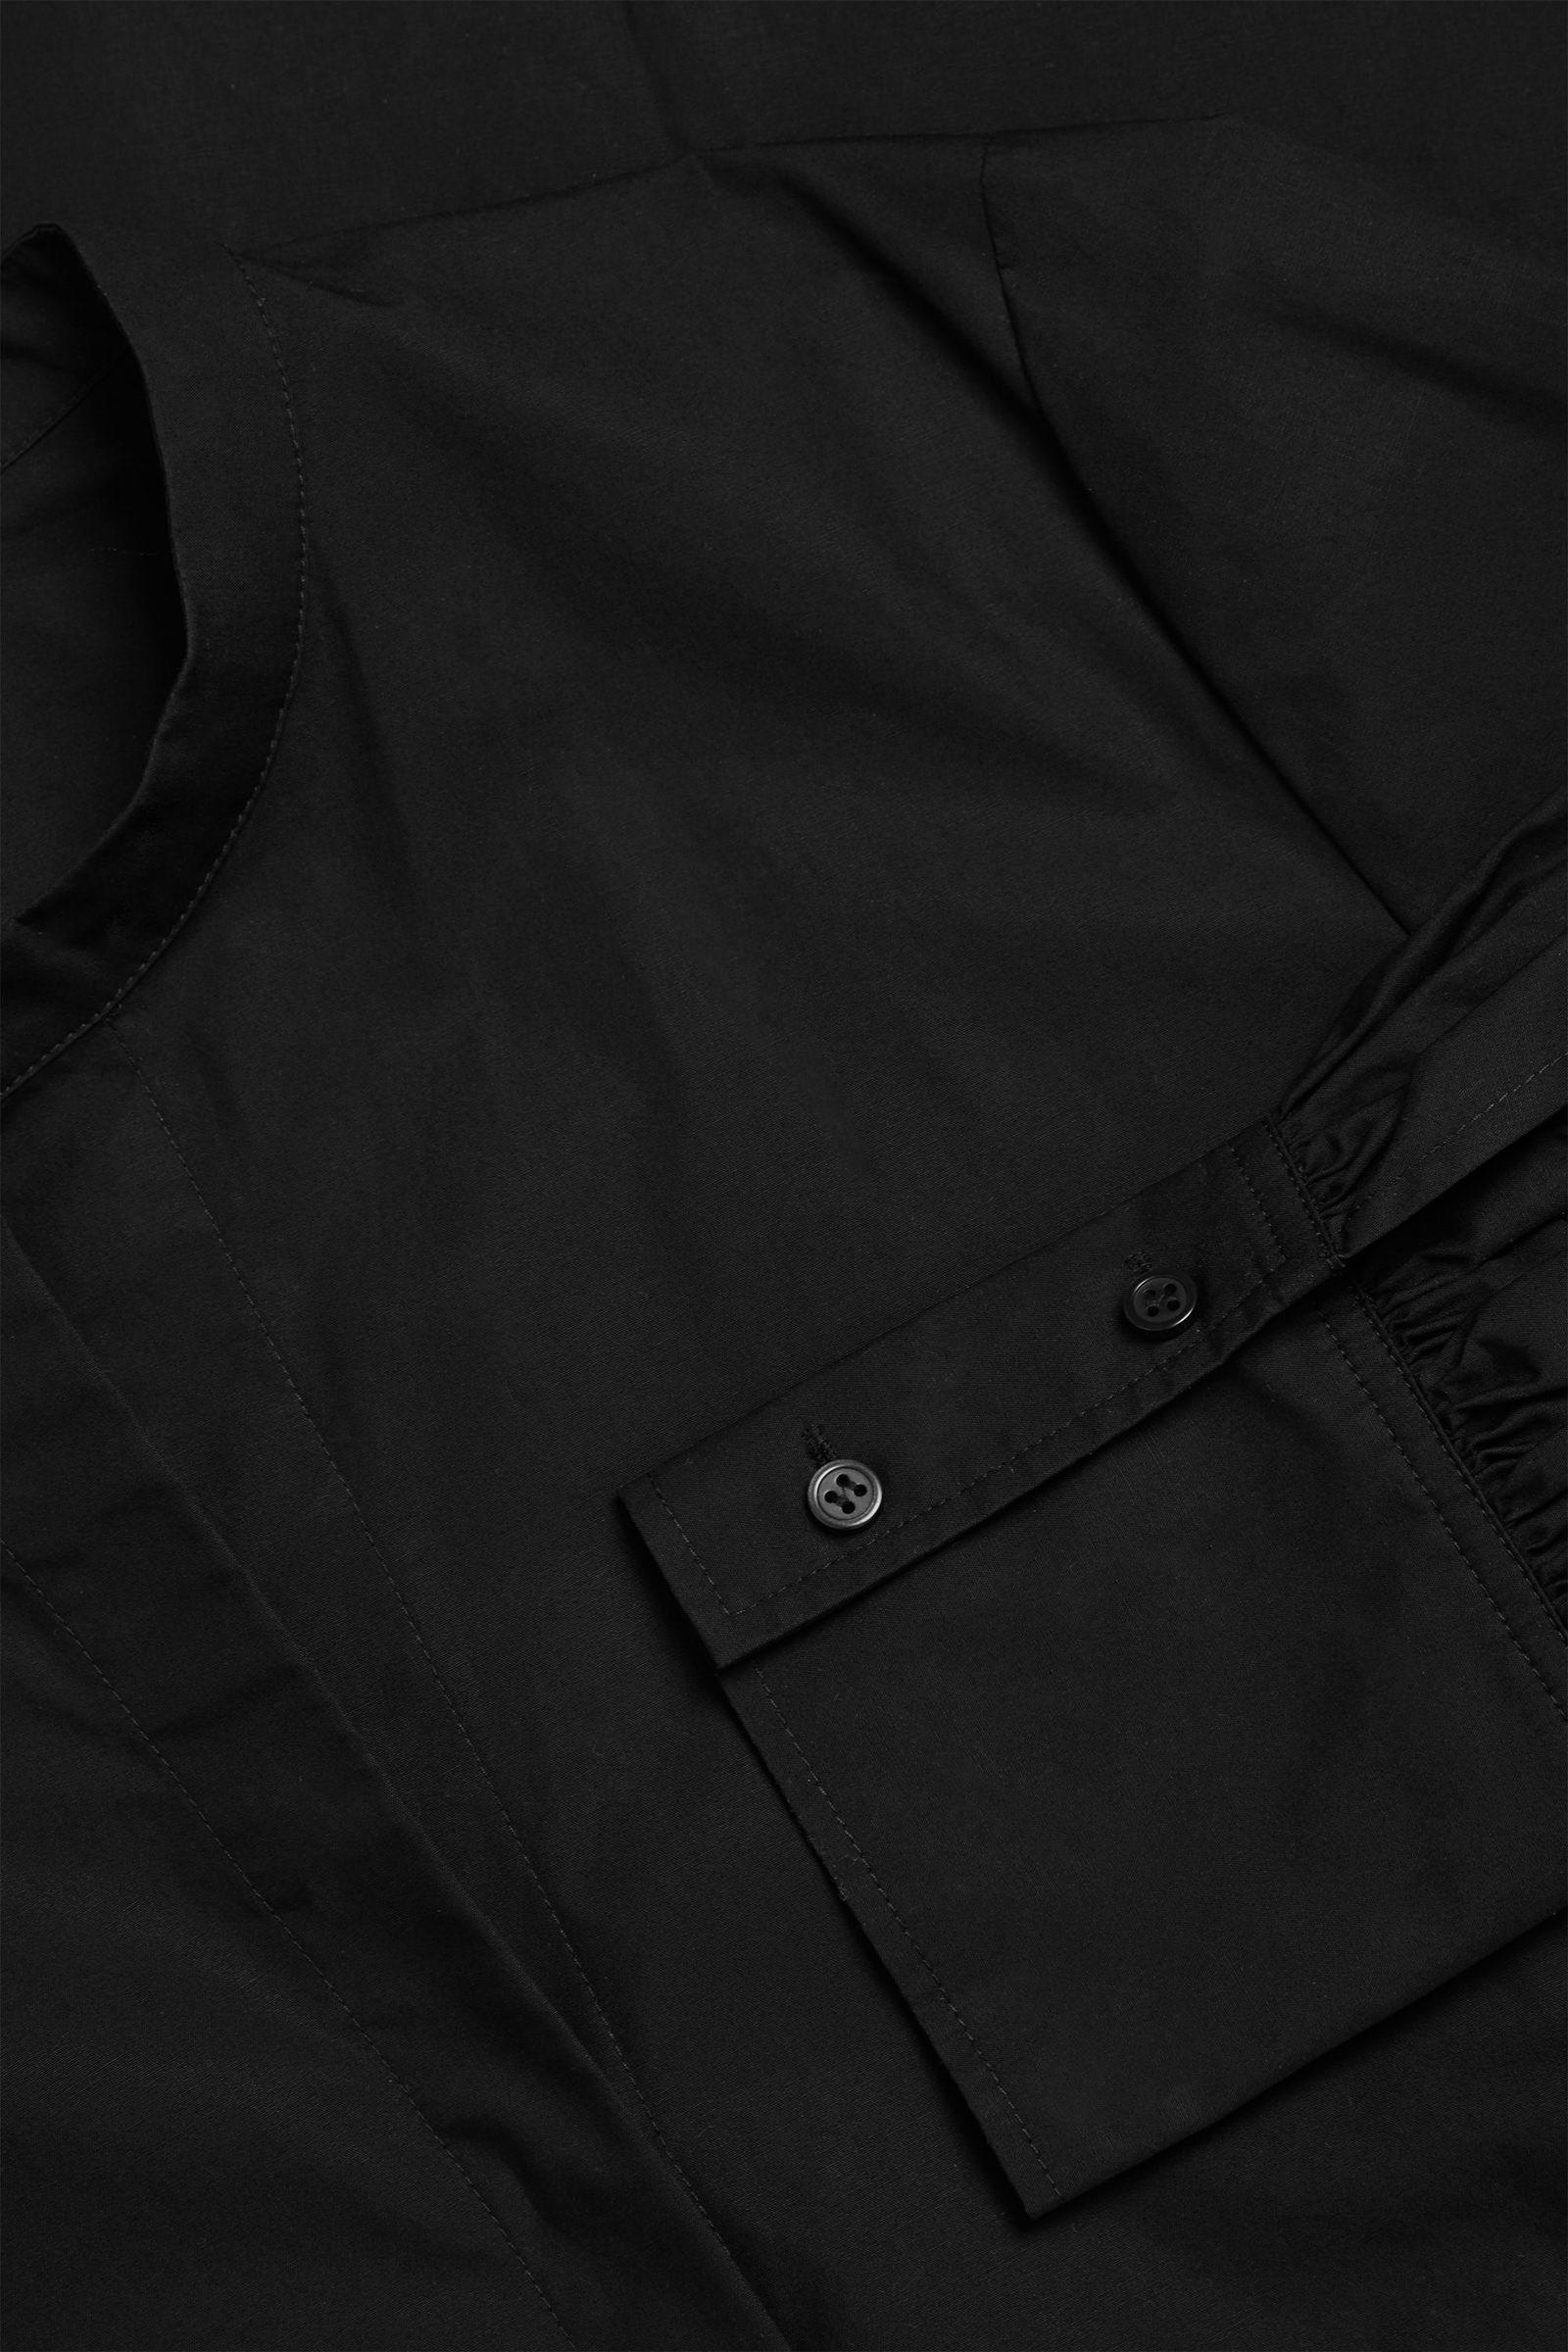 COS 코튼 볼륨 슬리브 미디 셔츠 드레스의 블랙컬러 Detail입니다.